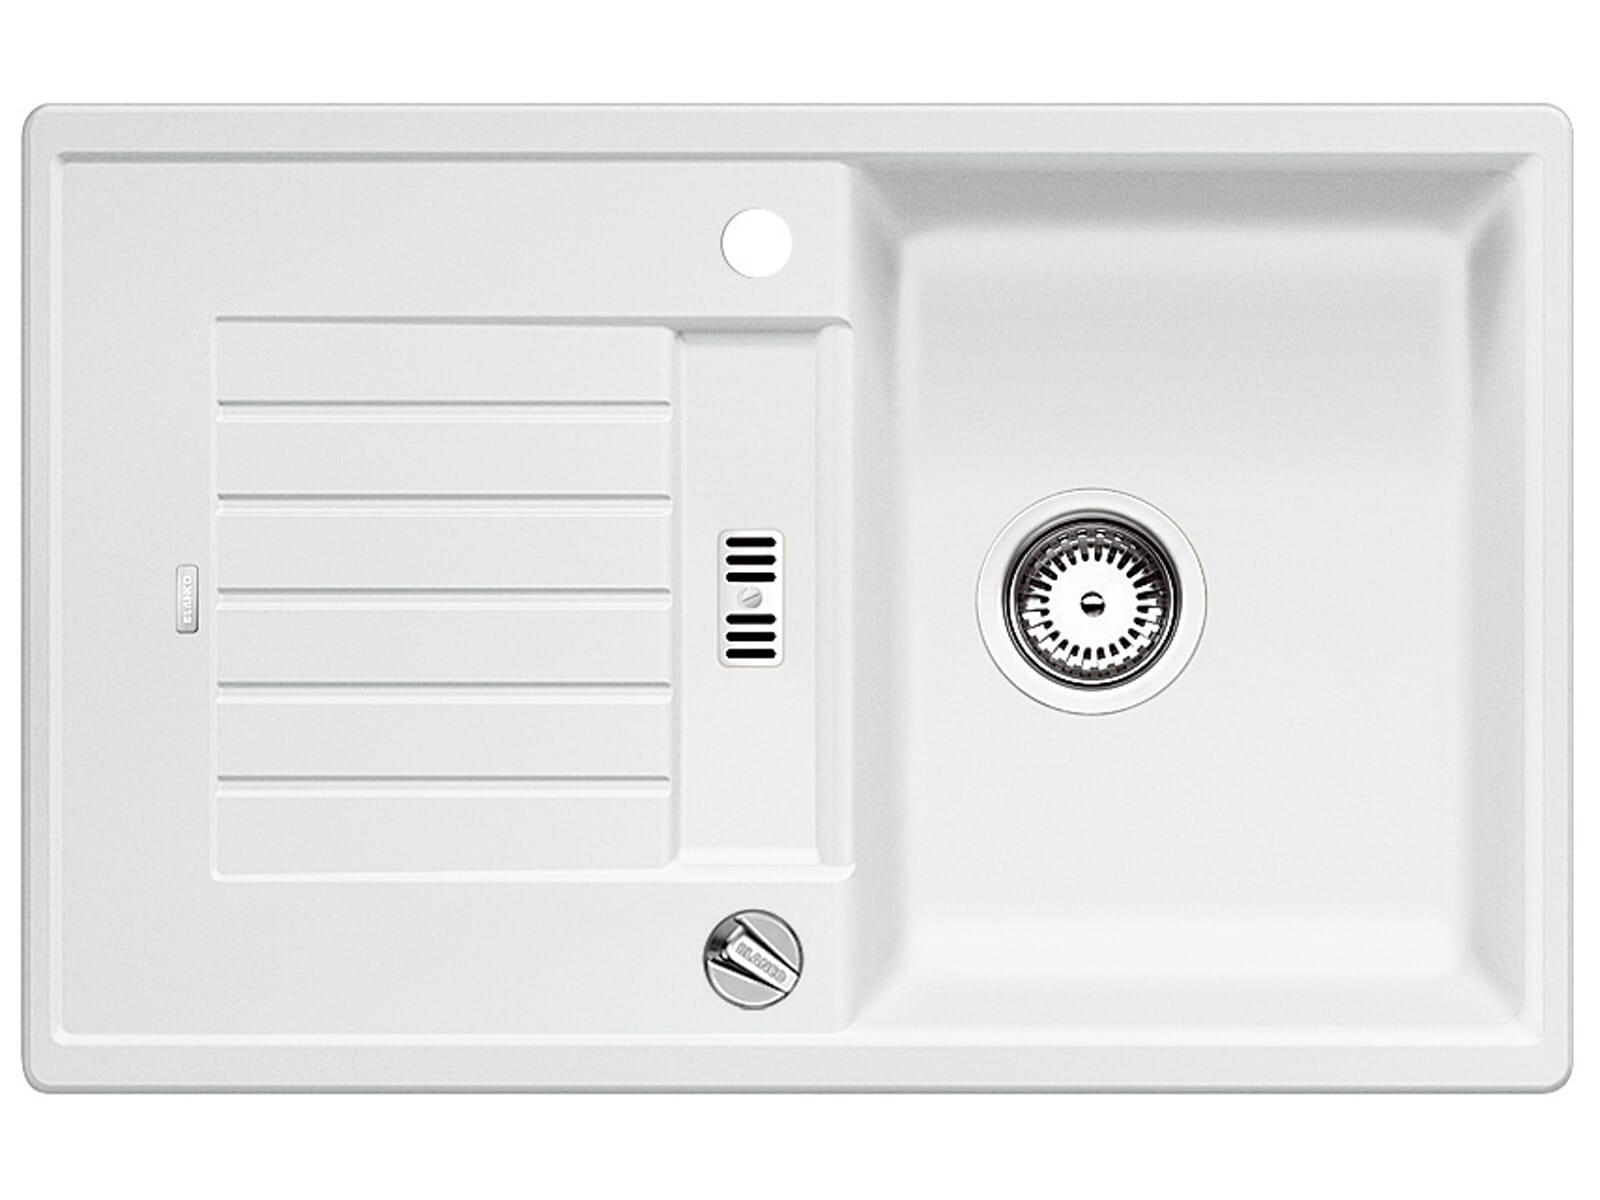 Blanco Zia 45 S Weiß - 514 718 Granitspüle